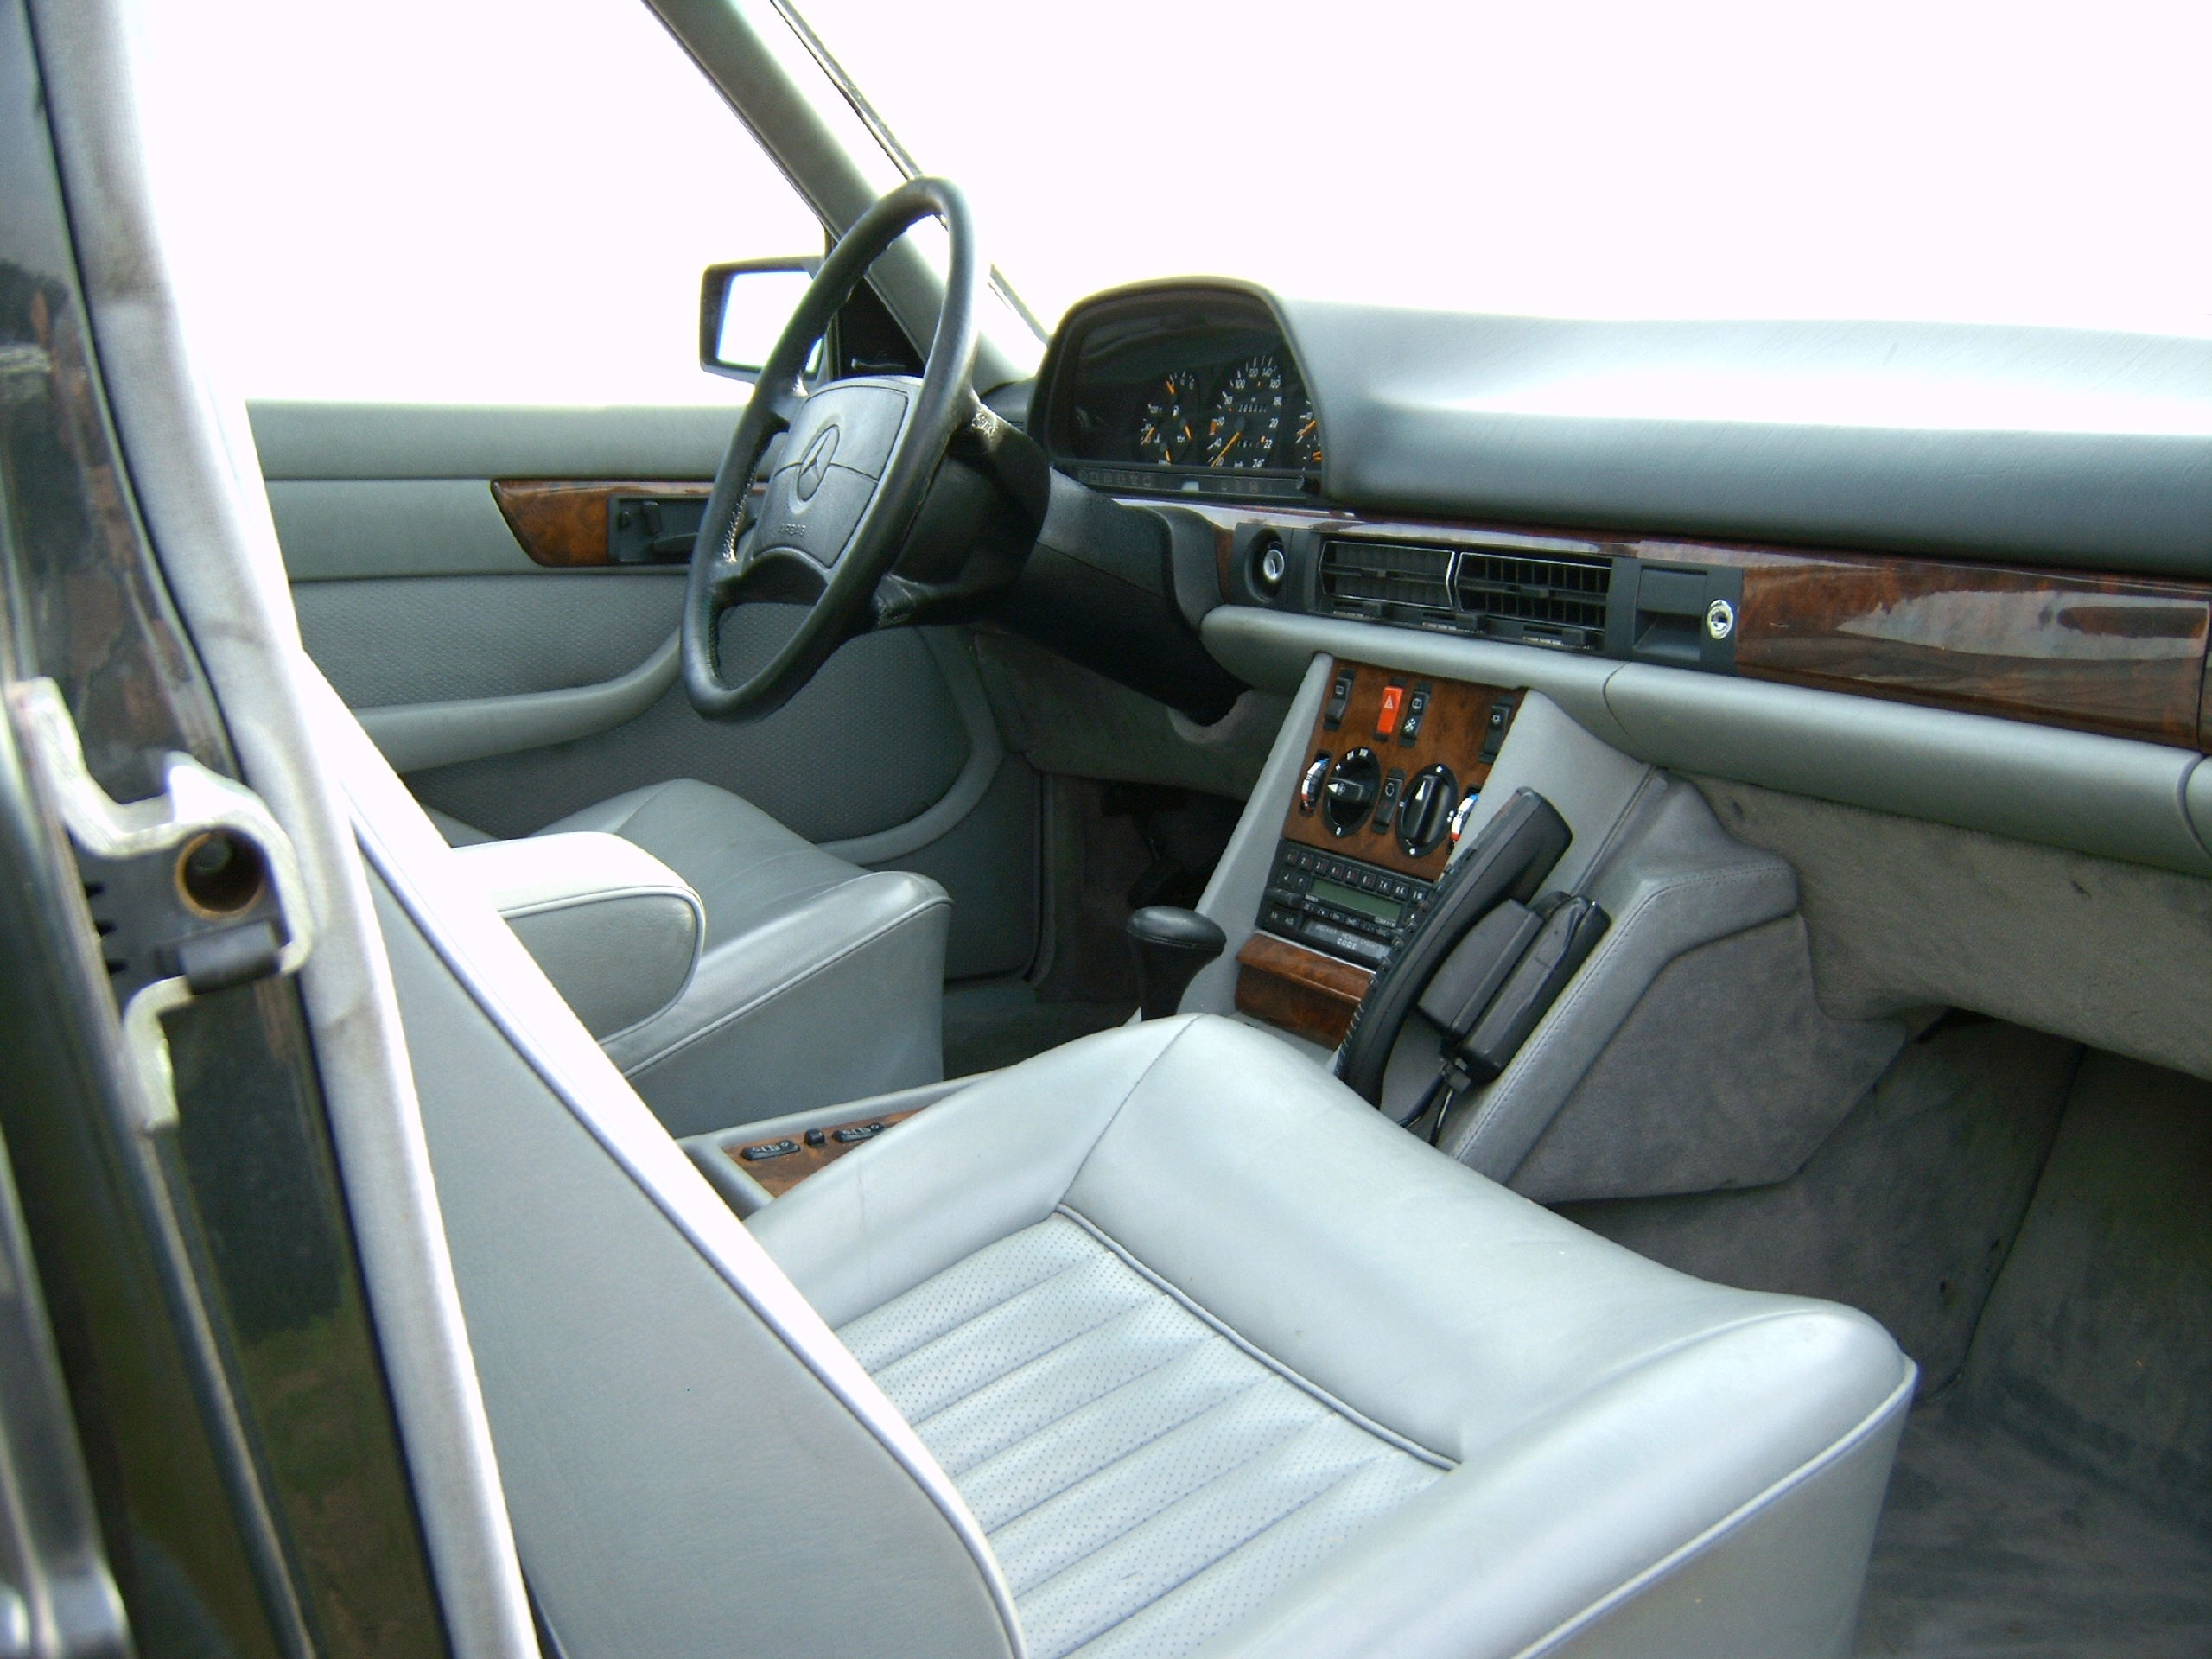 File:Mercedes W126 500SEL Armaturenbrett 1.jpg - Wikimedia Commons | {Armaturenbrett mercedes 62}